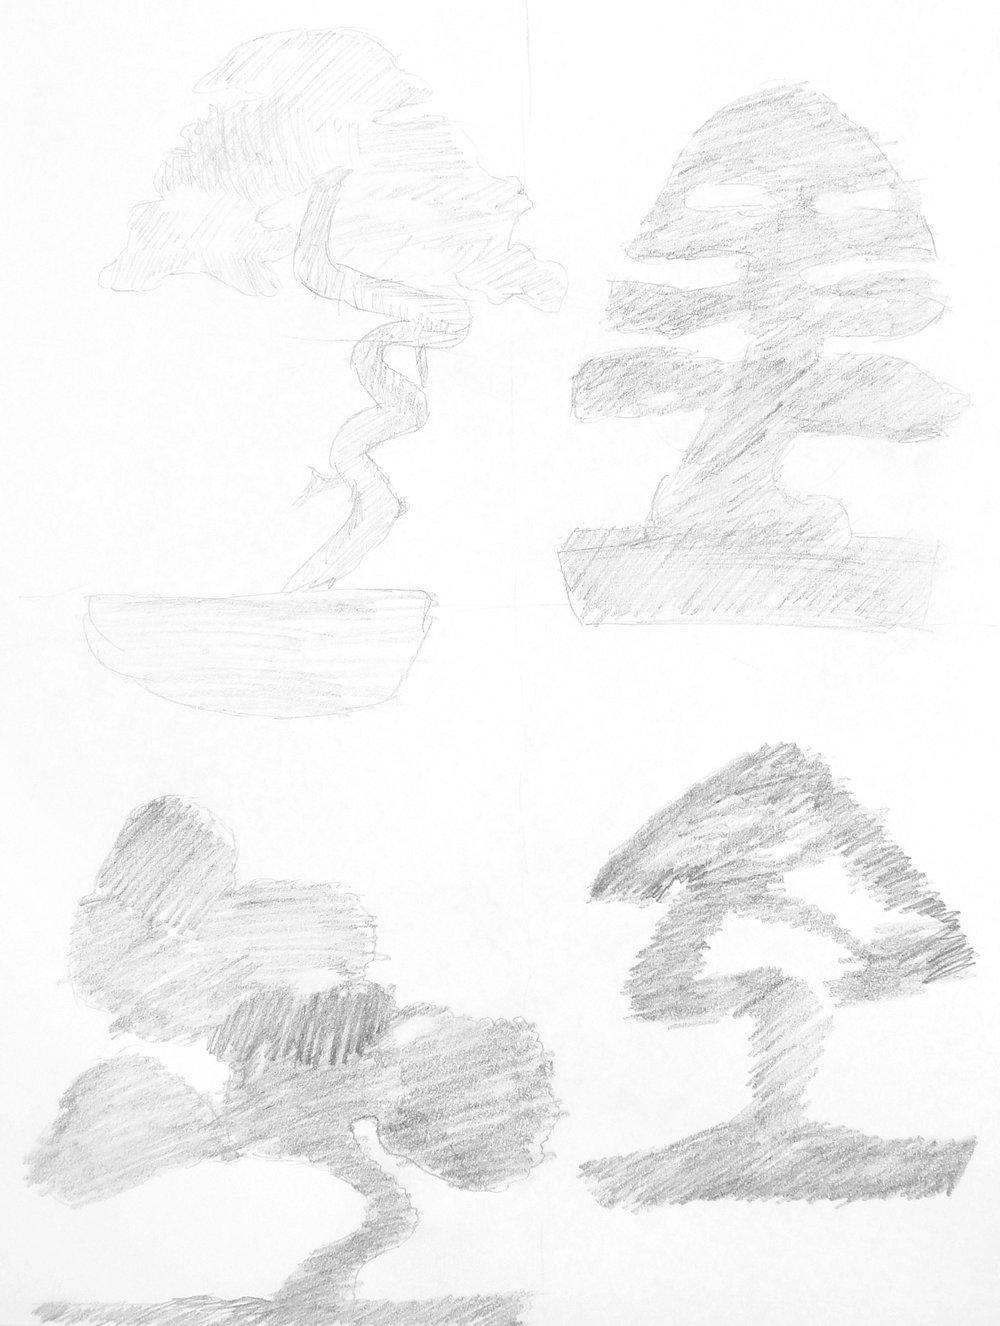 Silhouette Studies